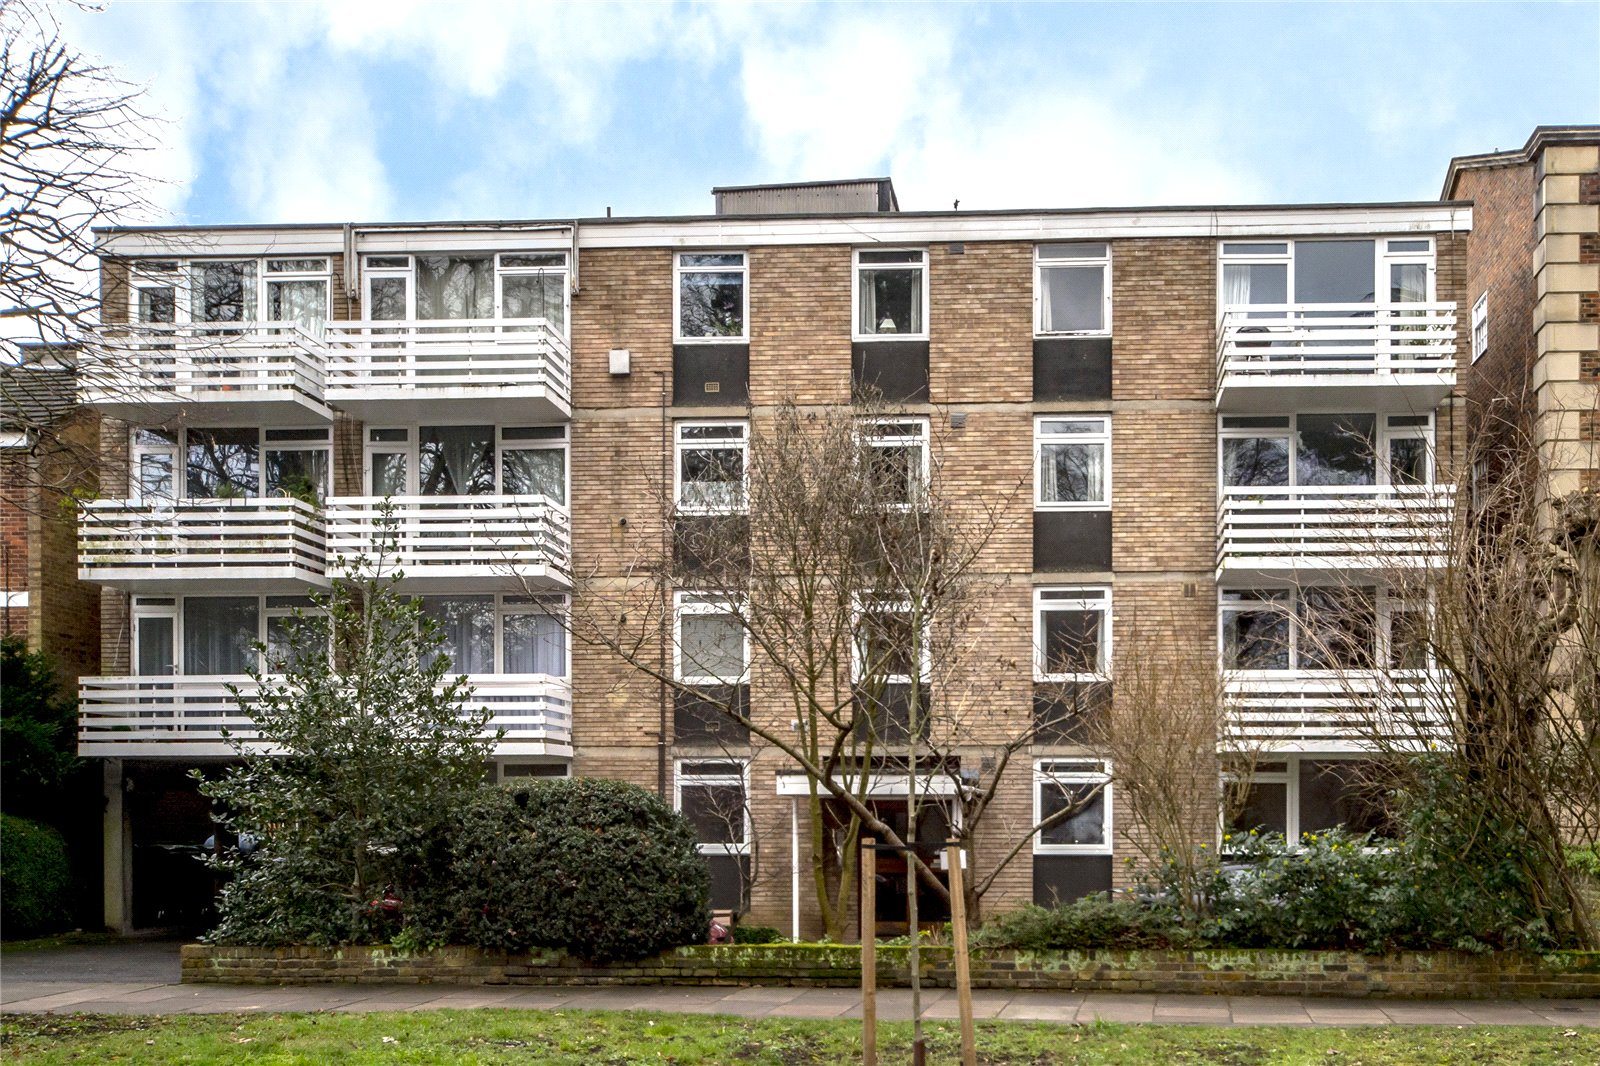 Dunraven House, 230 Kew Road, TW9 3LG - Antony Roberts